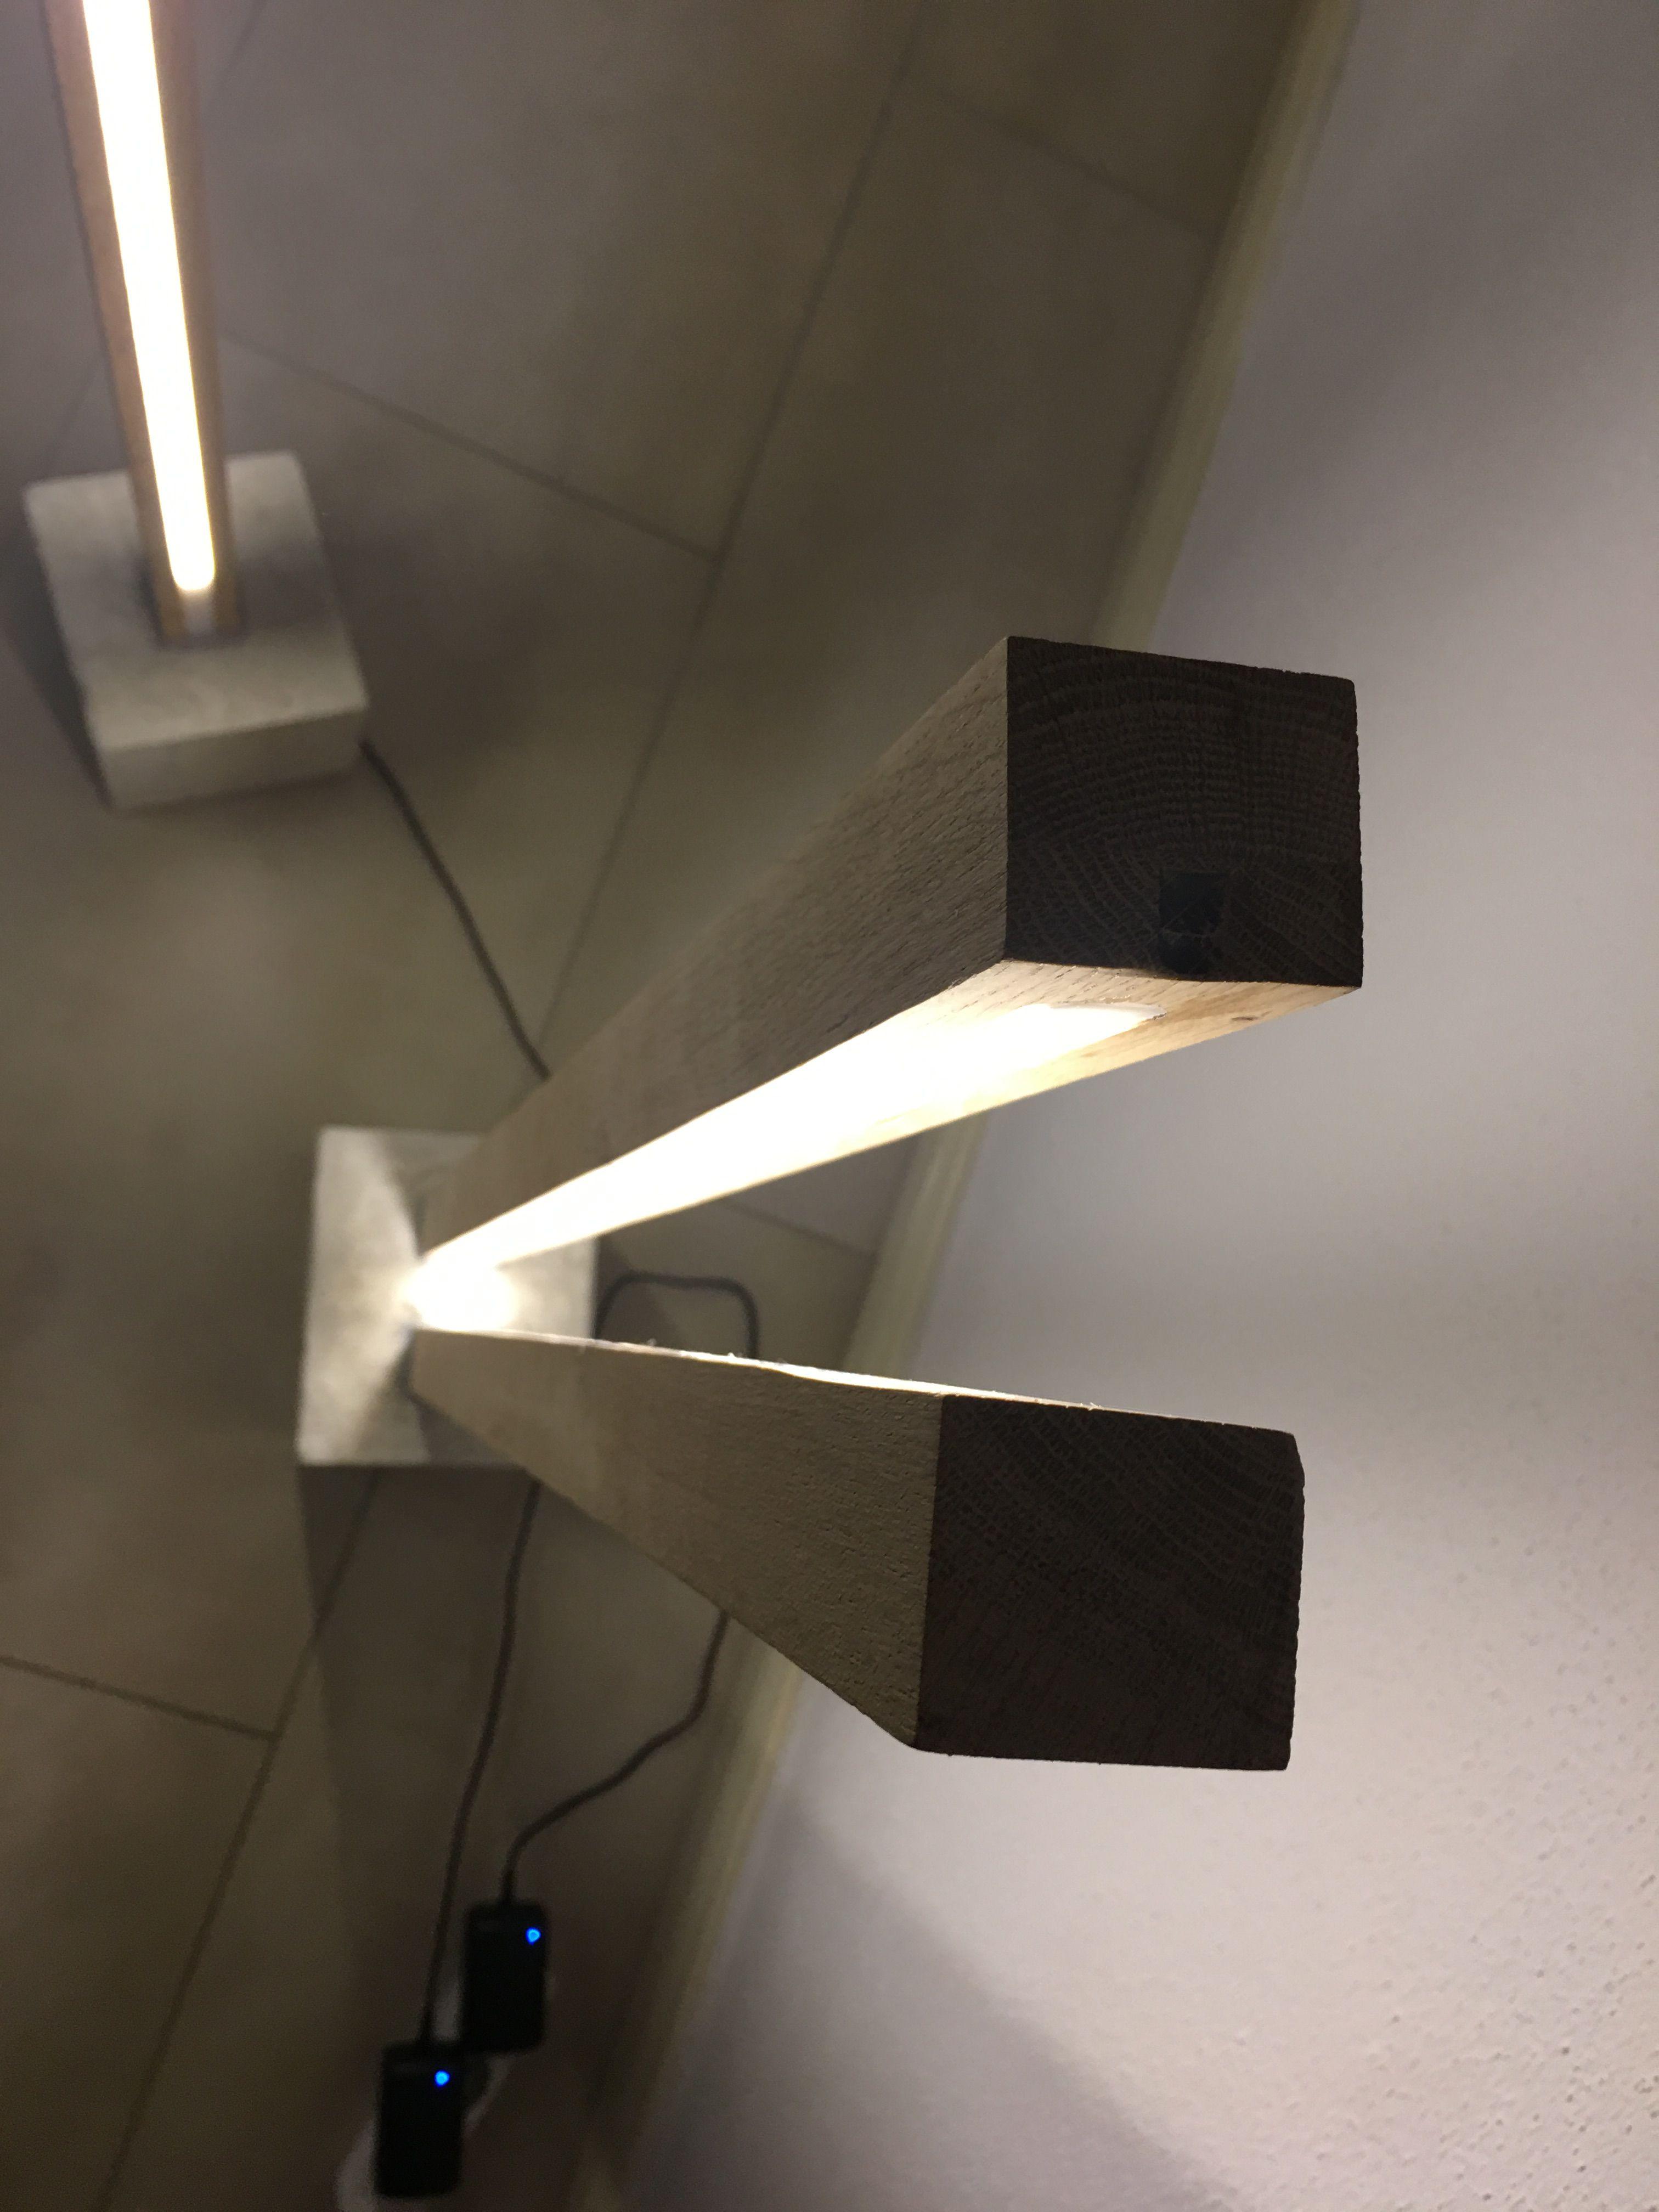 Stehlampe Lichtsaule Eiche Mit Beton Sockel Led Streifen Led